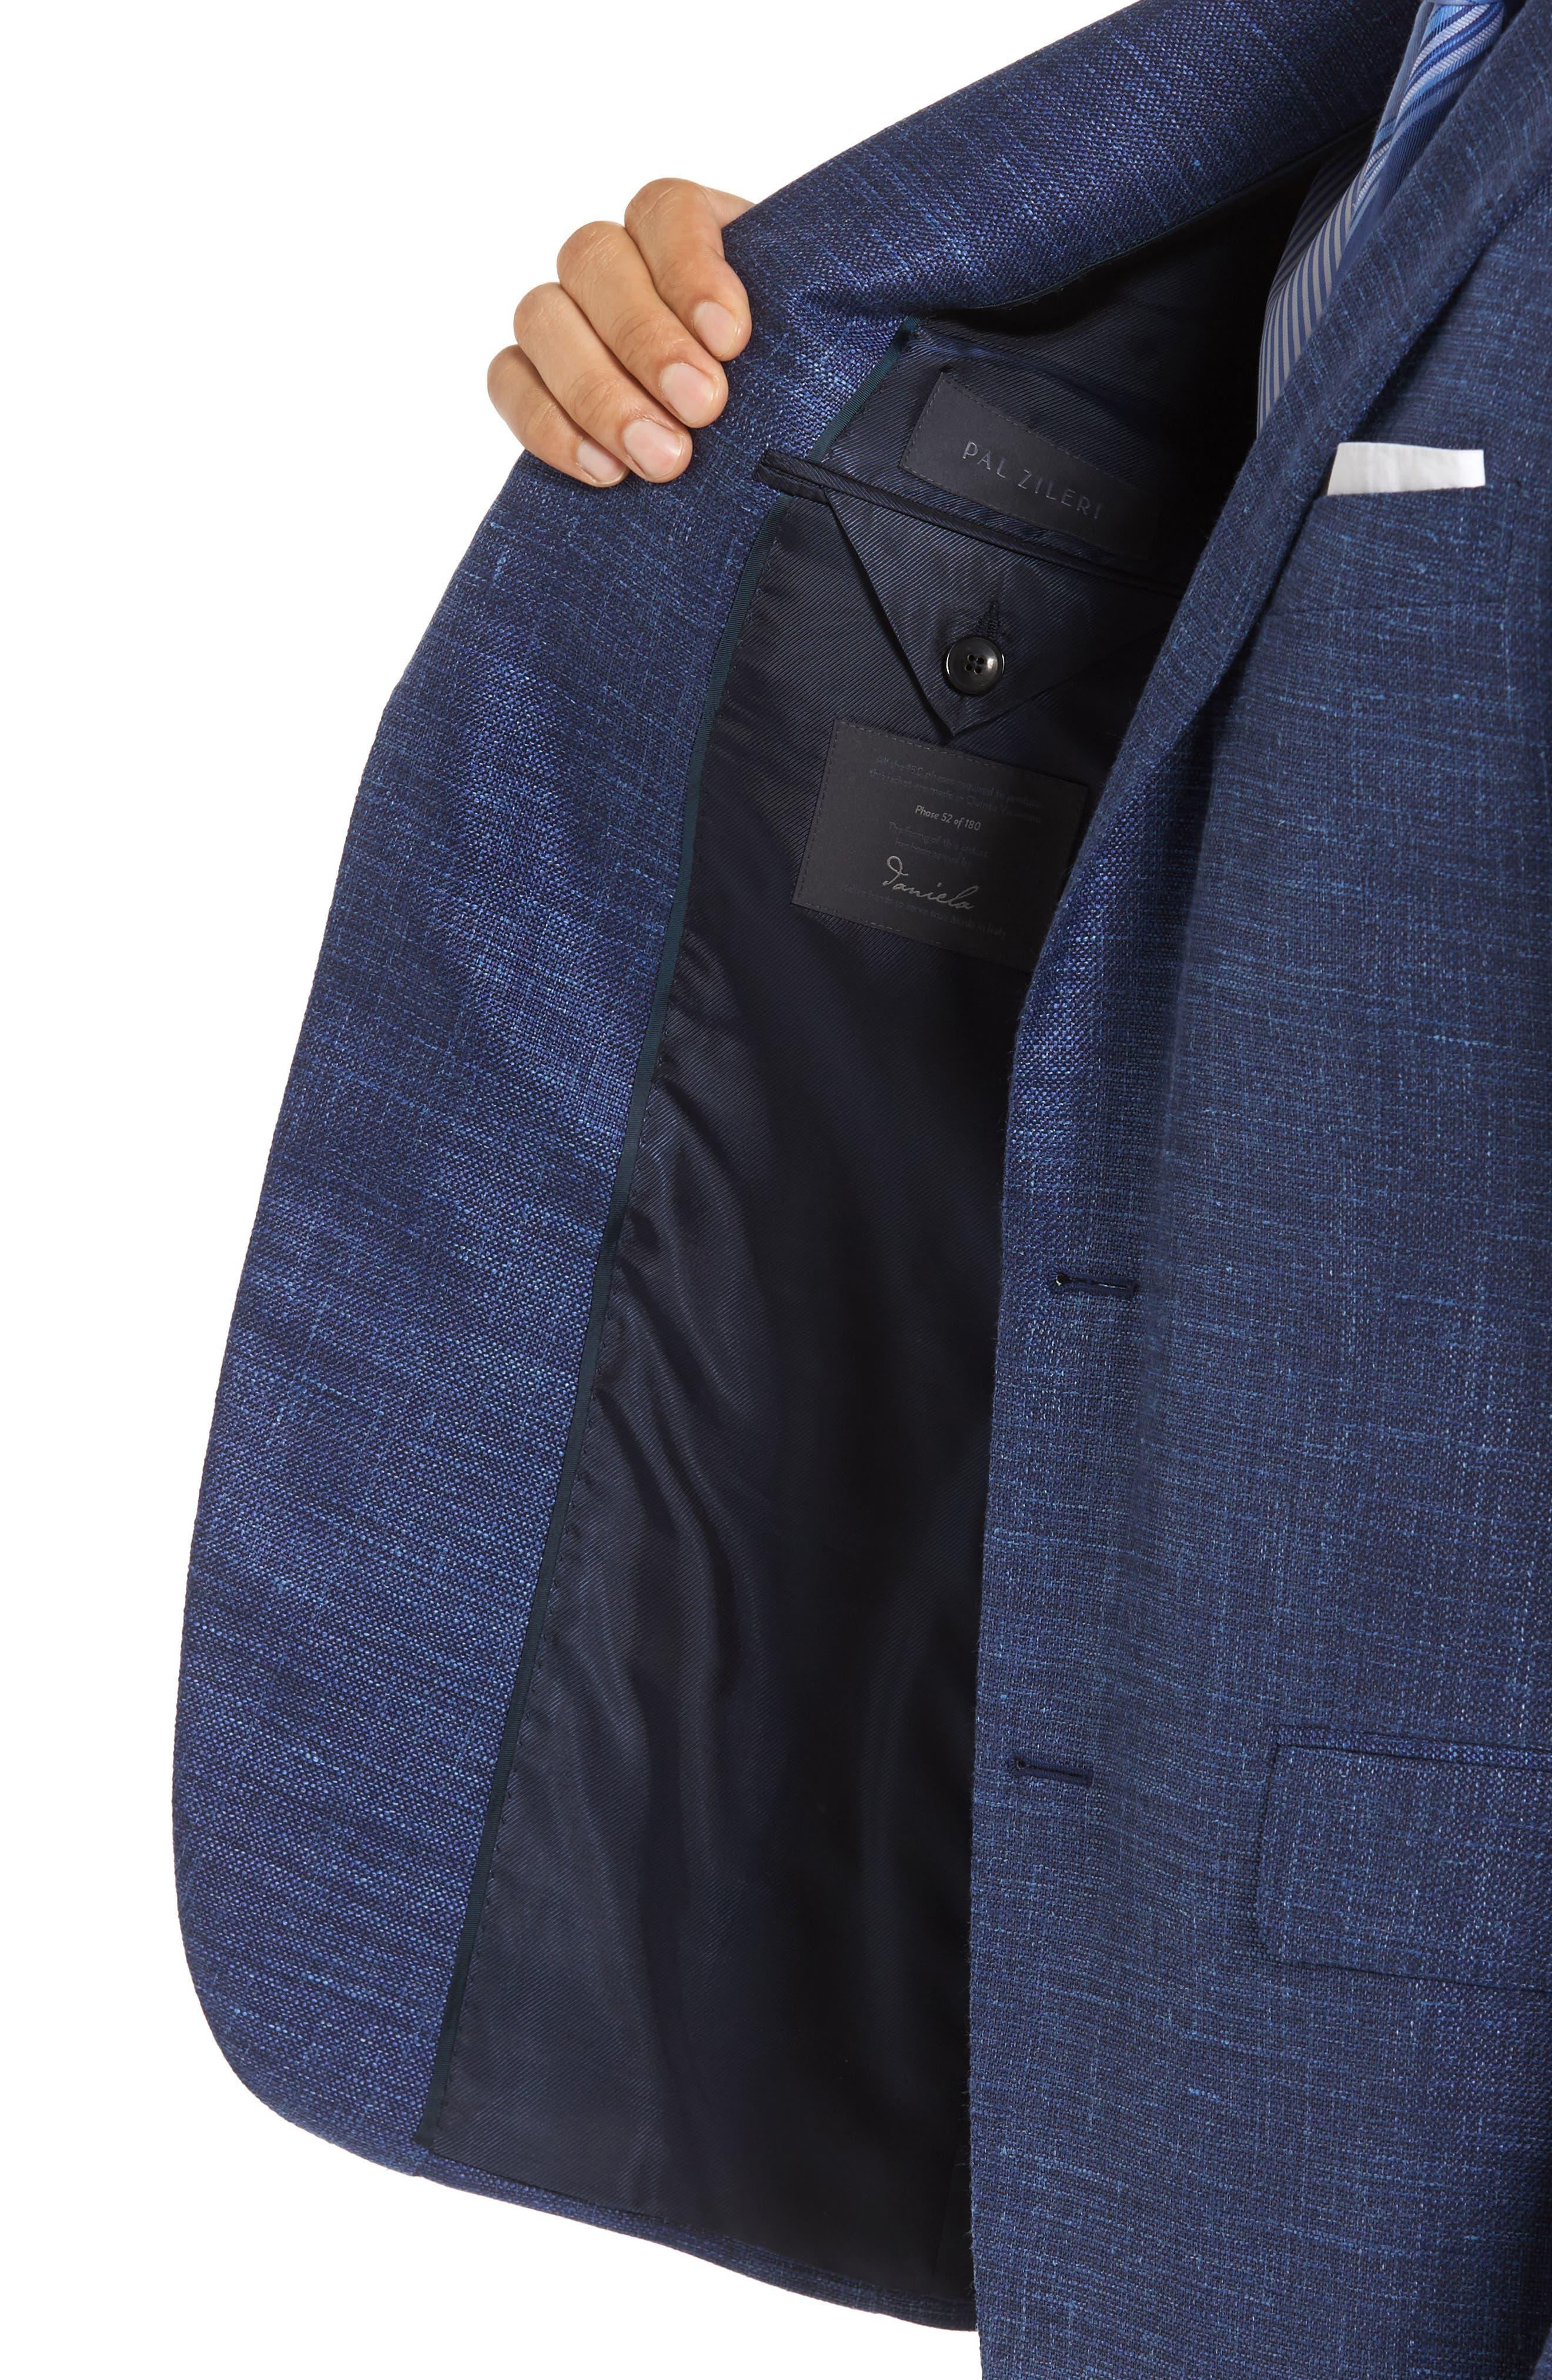 Plaid Wool Blend Blazer,                             Alternate thumbnail 4, color,                             Blue